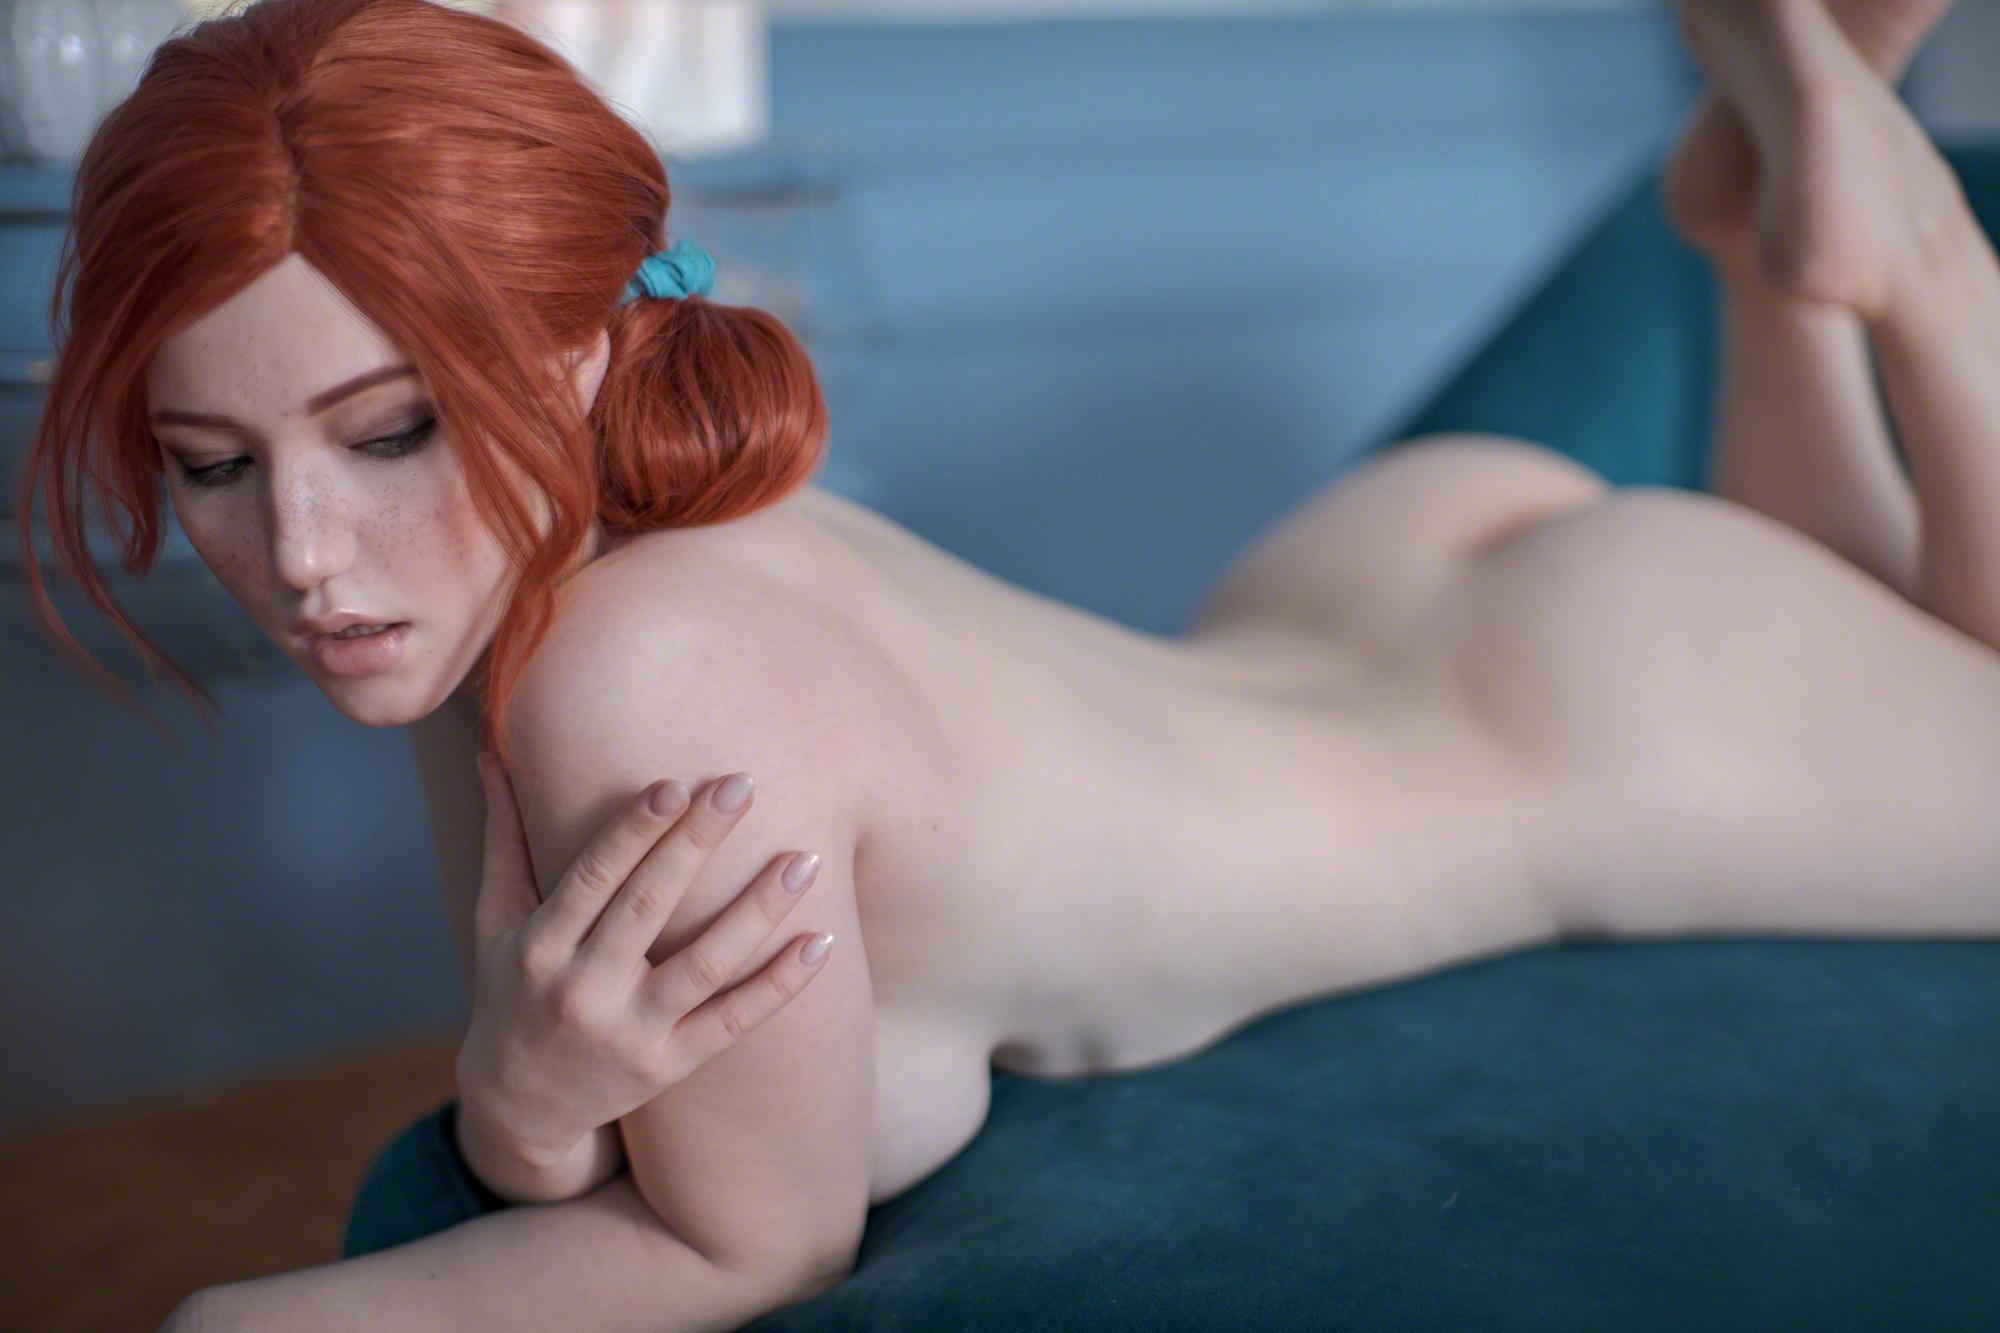 Leaked Nude Set From Lada Lyumos Patreon 0028